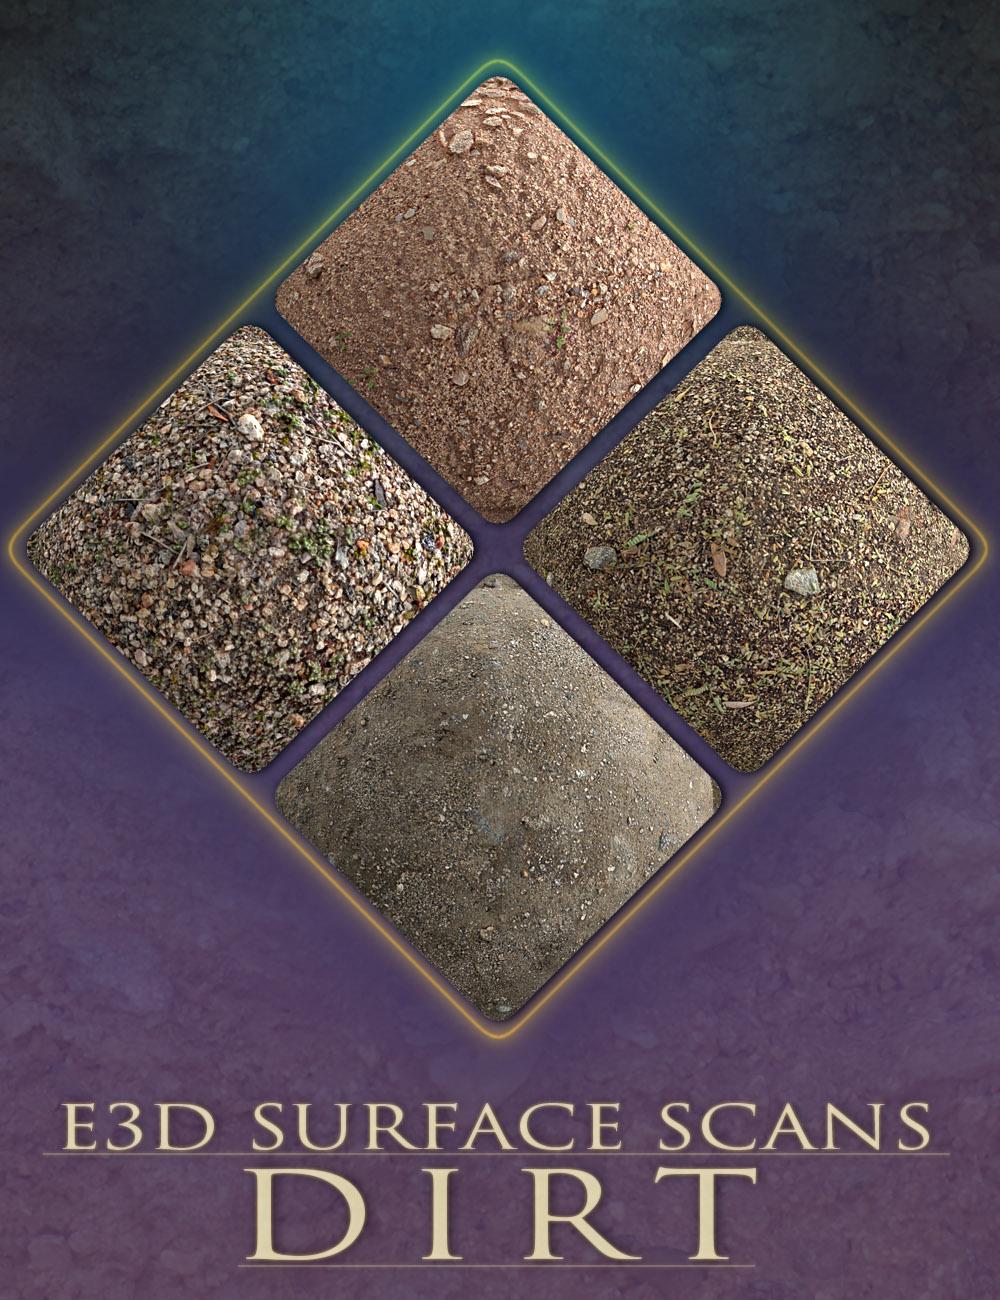 E3D Surface Scans - Dirt Textures and Merchant Resource by: EcoManiac3D, 3D Models by Daz 3D